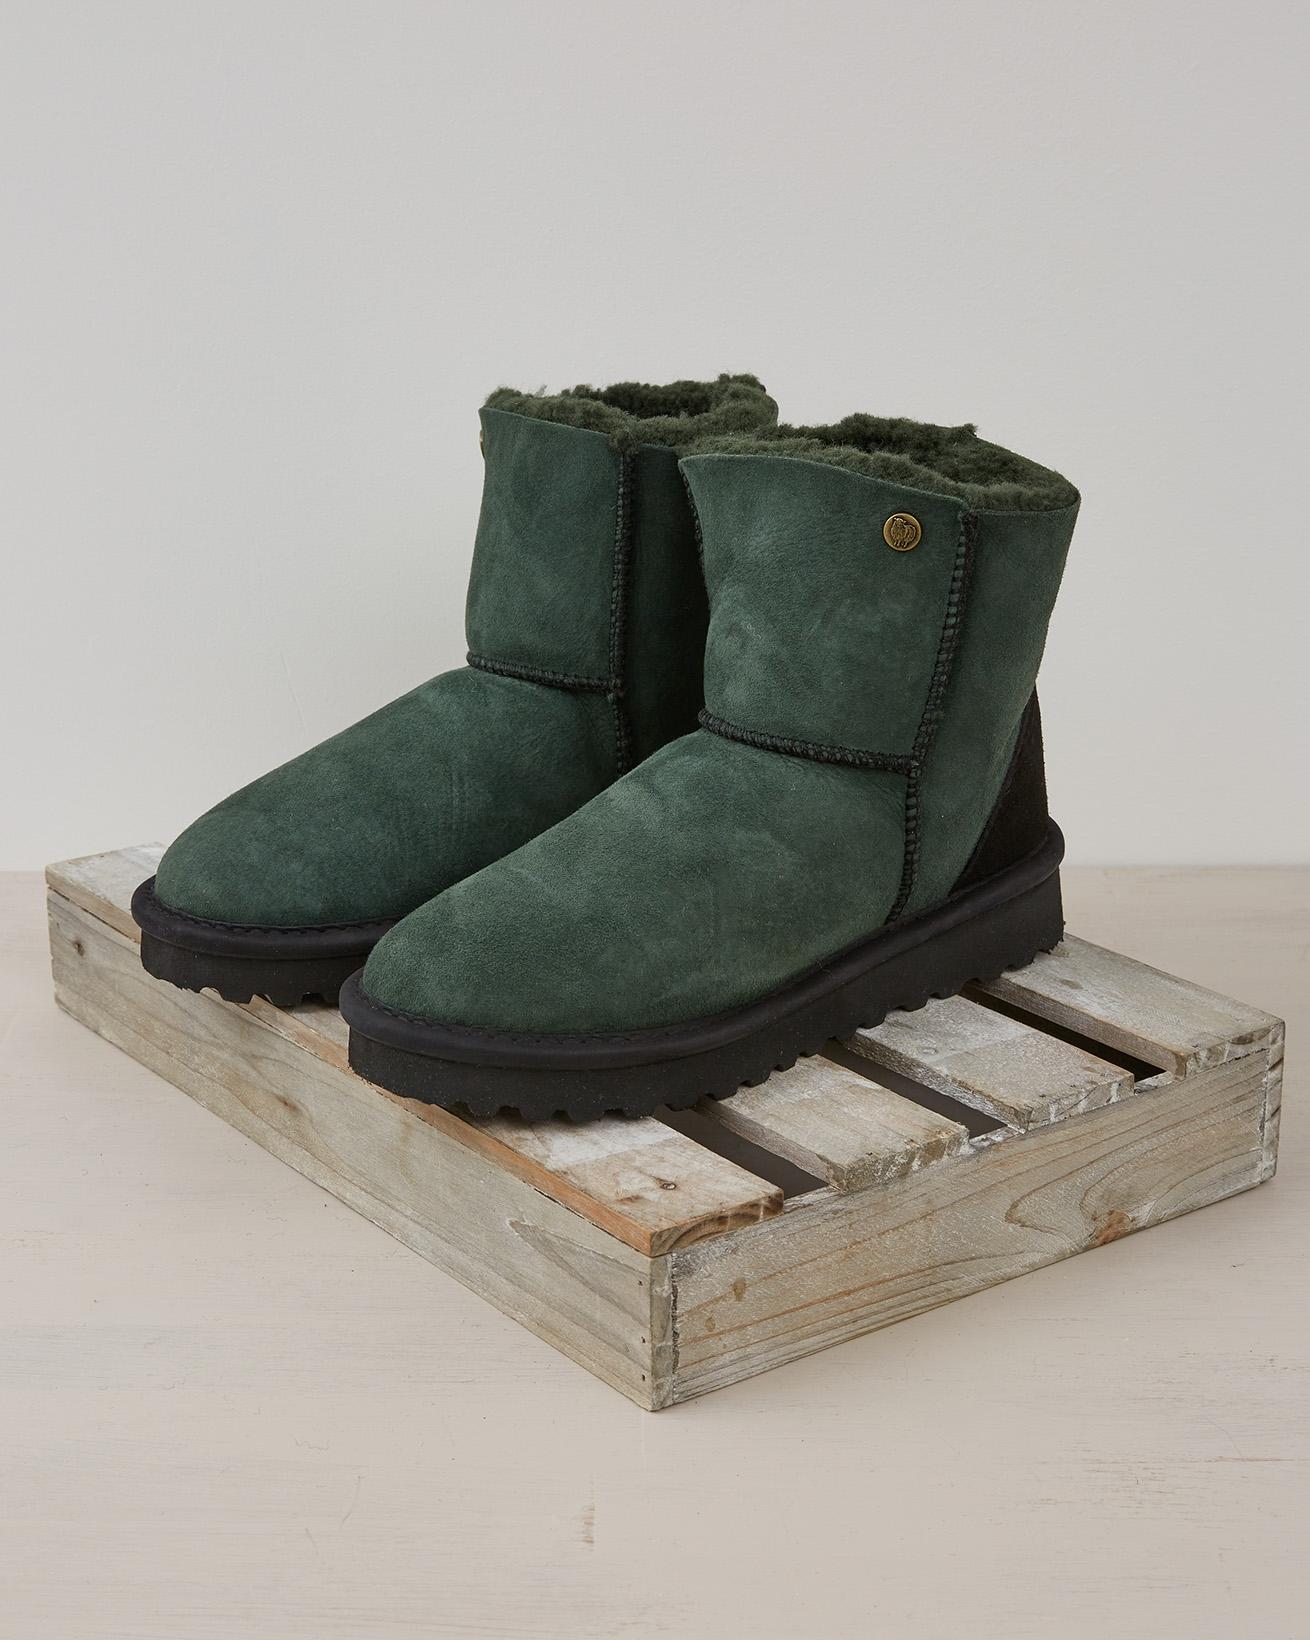 Ladies Celt Shortie Boots - Size 6 - Forest Green - 2385